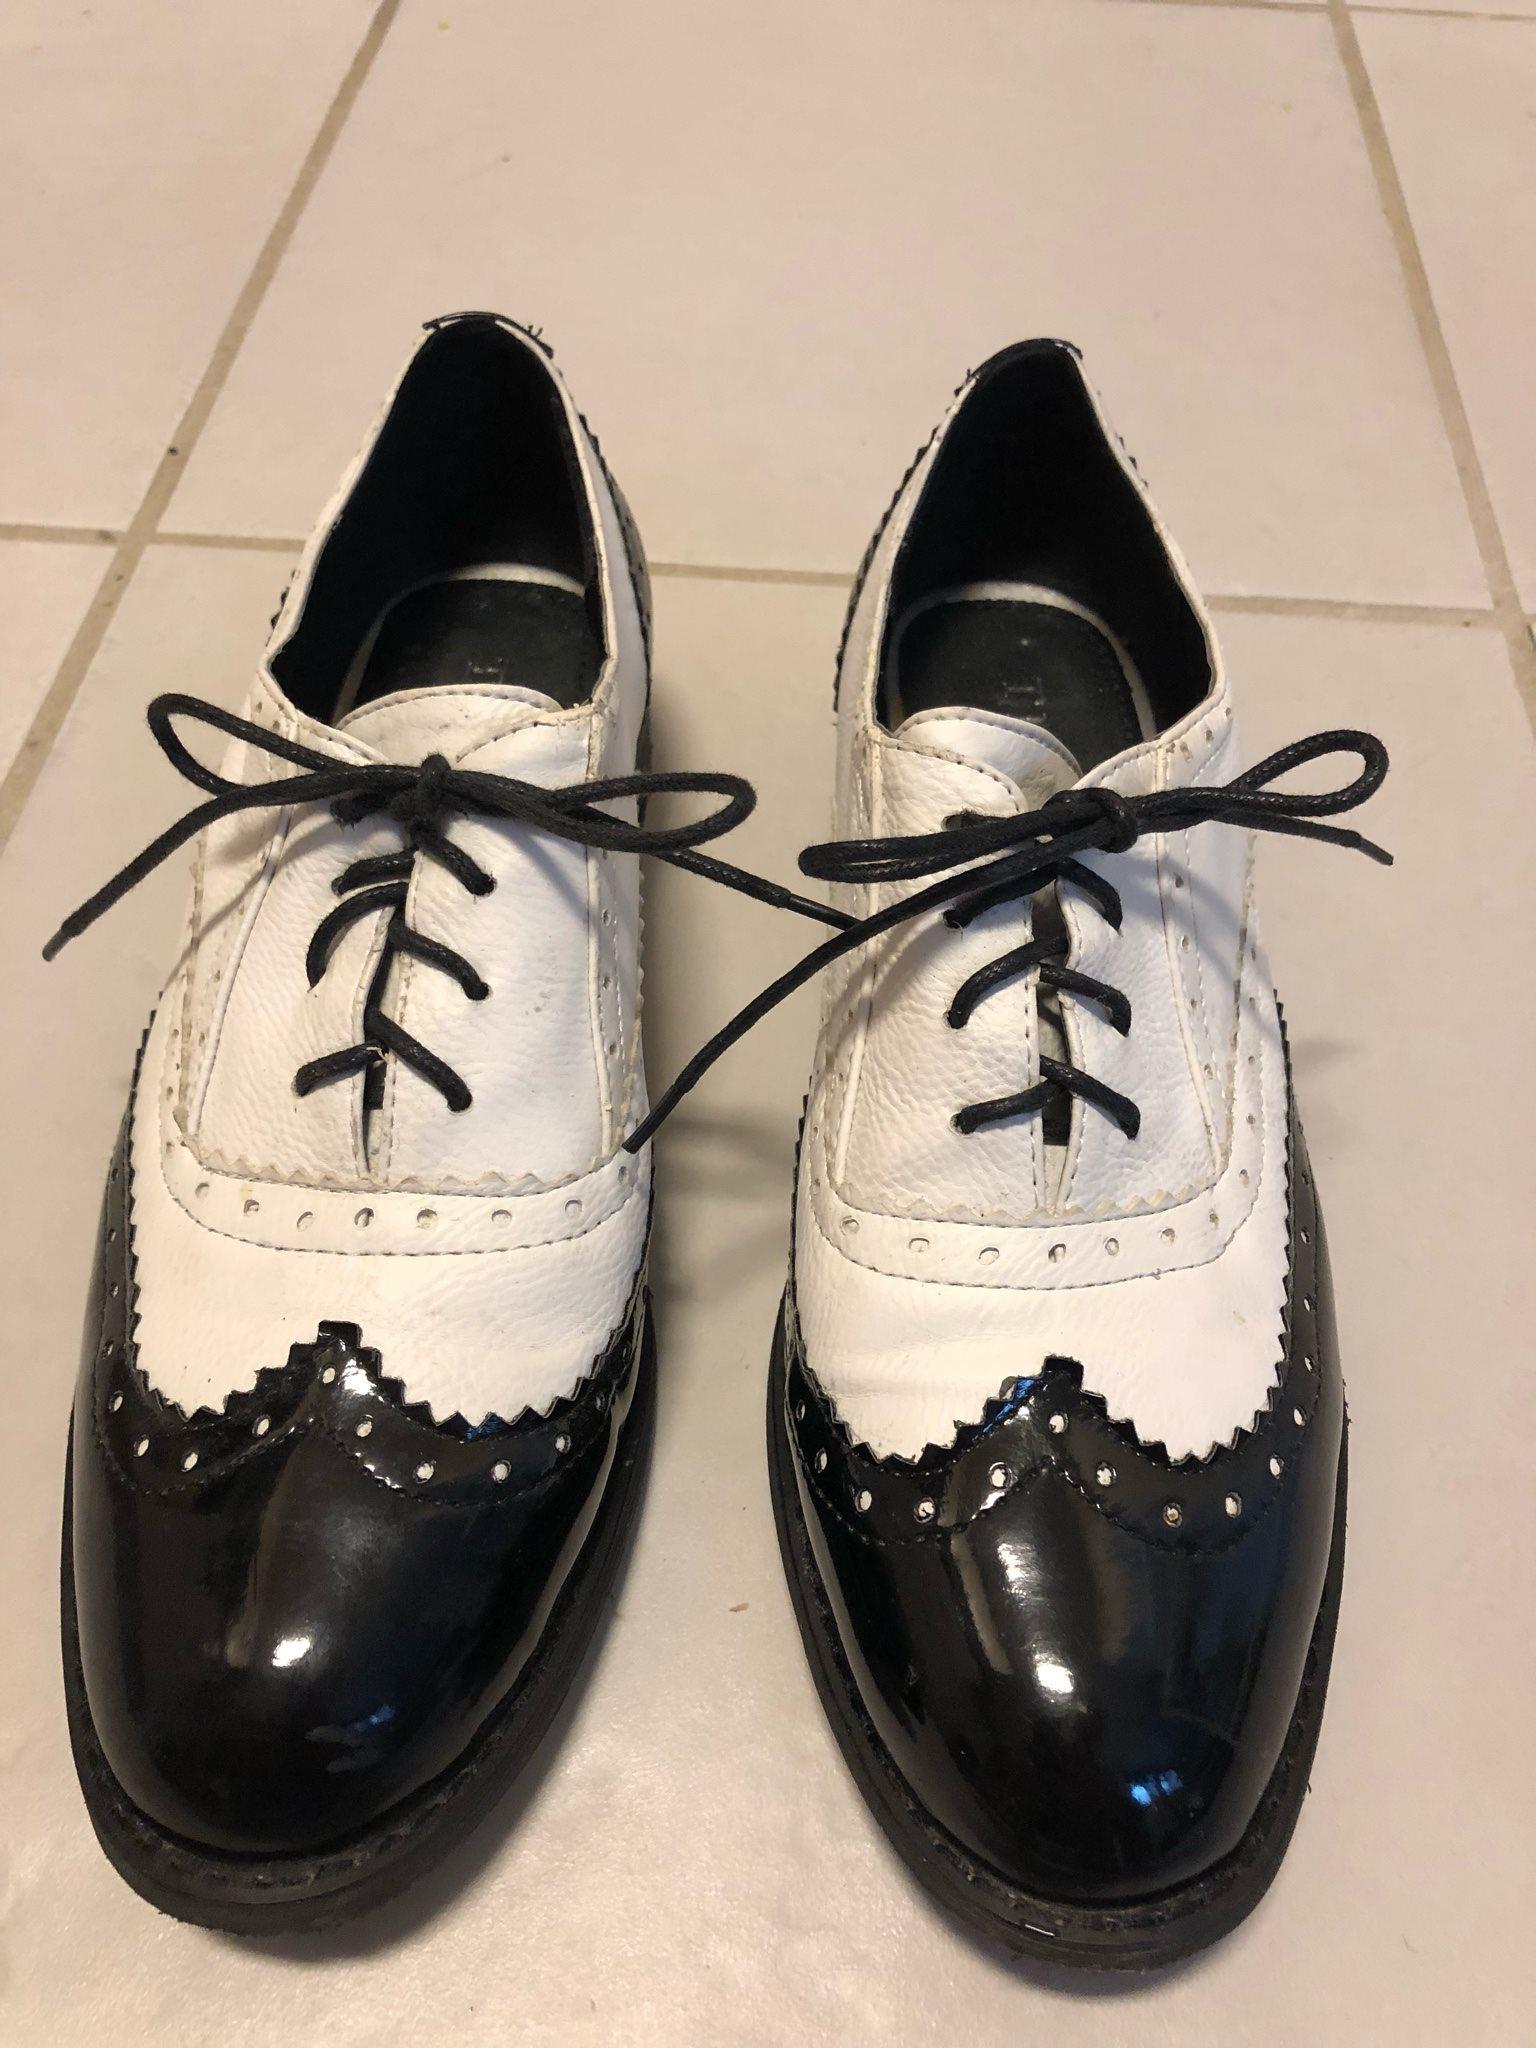 buy popular 2e841 2f4a3 inspirerade inspirerade Gatsby inspirerade Gatsby Gatsby inspirerade Gatsby  inspirerade Gatsby 4P05qgwd